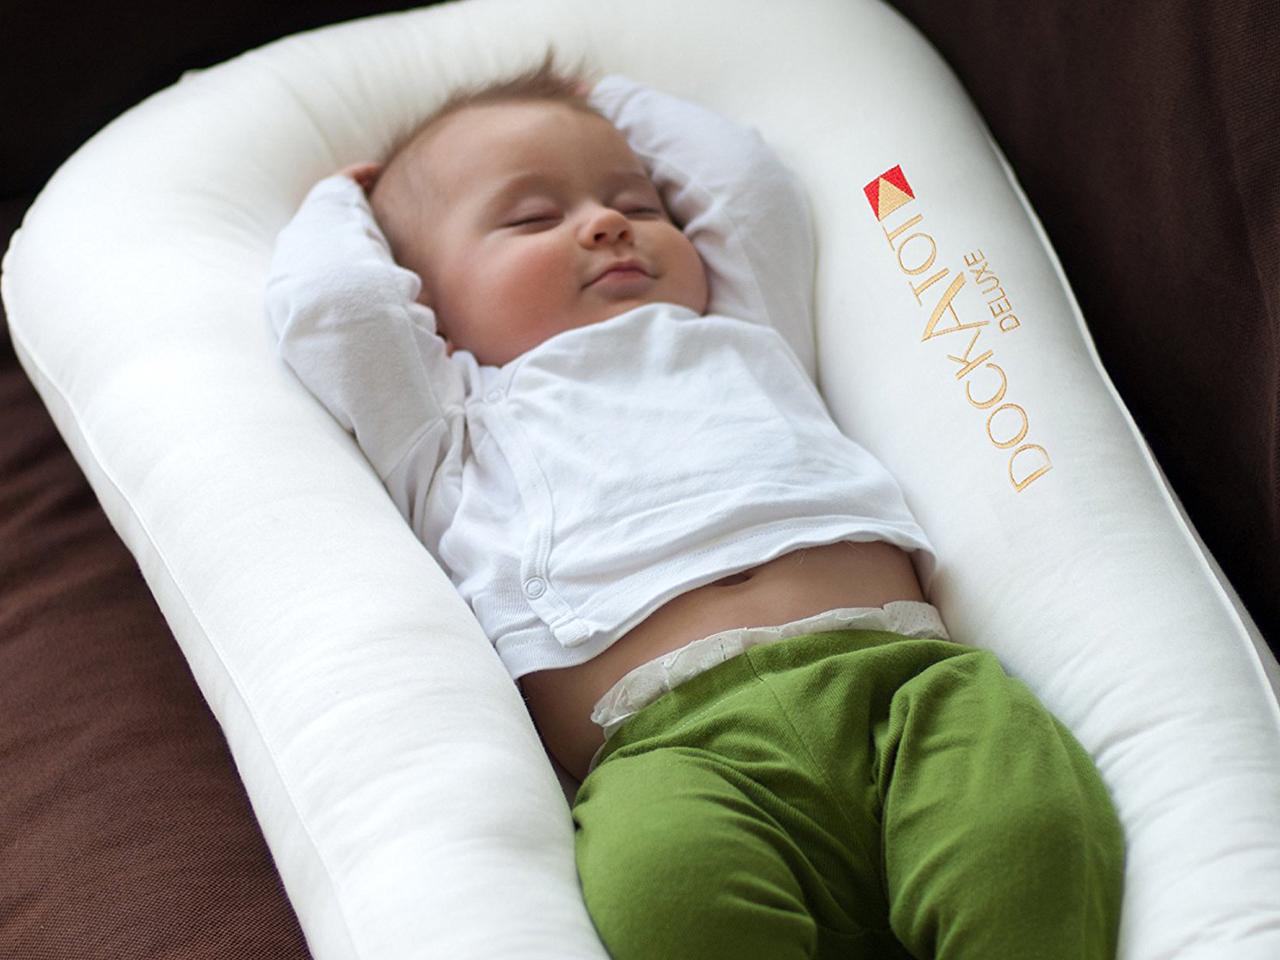 Is the DockATot safe? - Kids First Pediatric